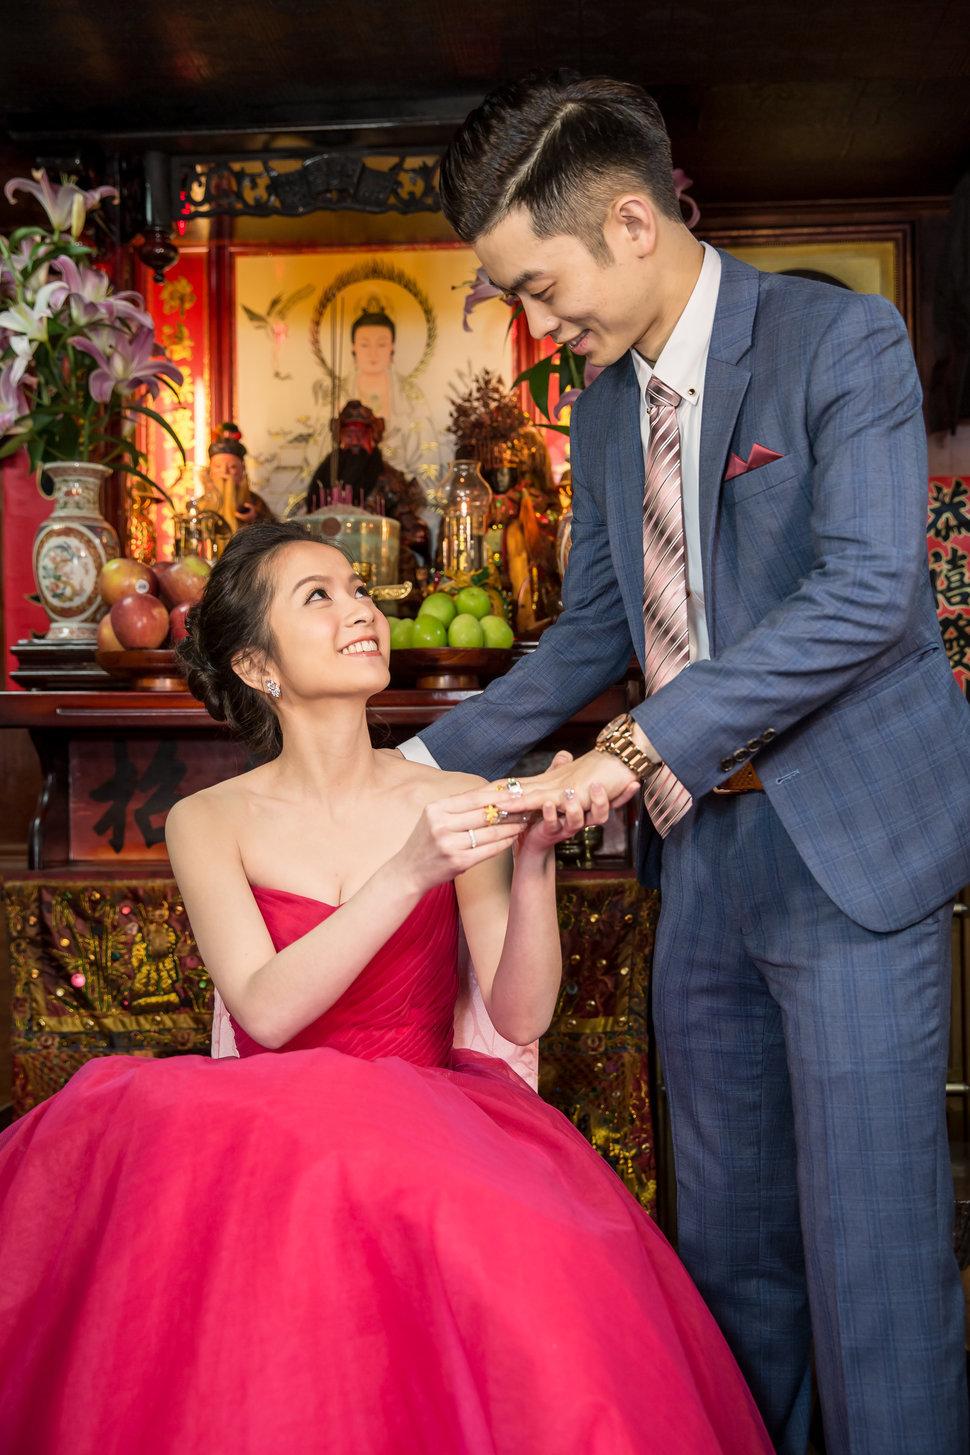 SIN_8132 - 板橋唐朝婚紗 - 結婚吧一站式婚禮服務平台